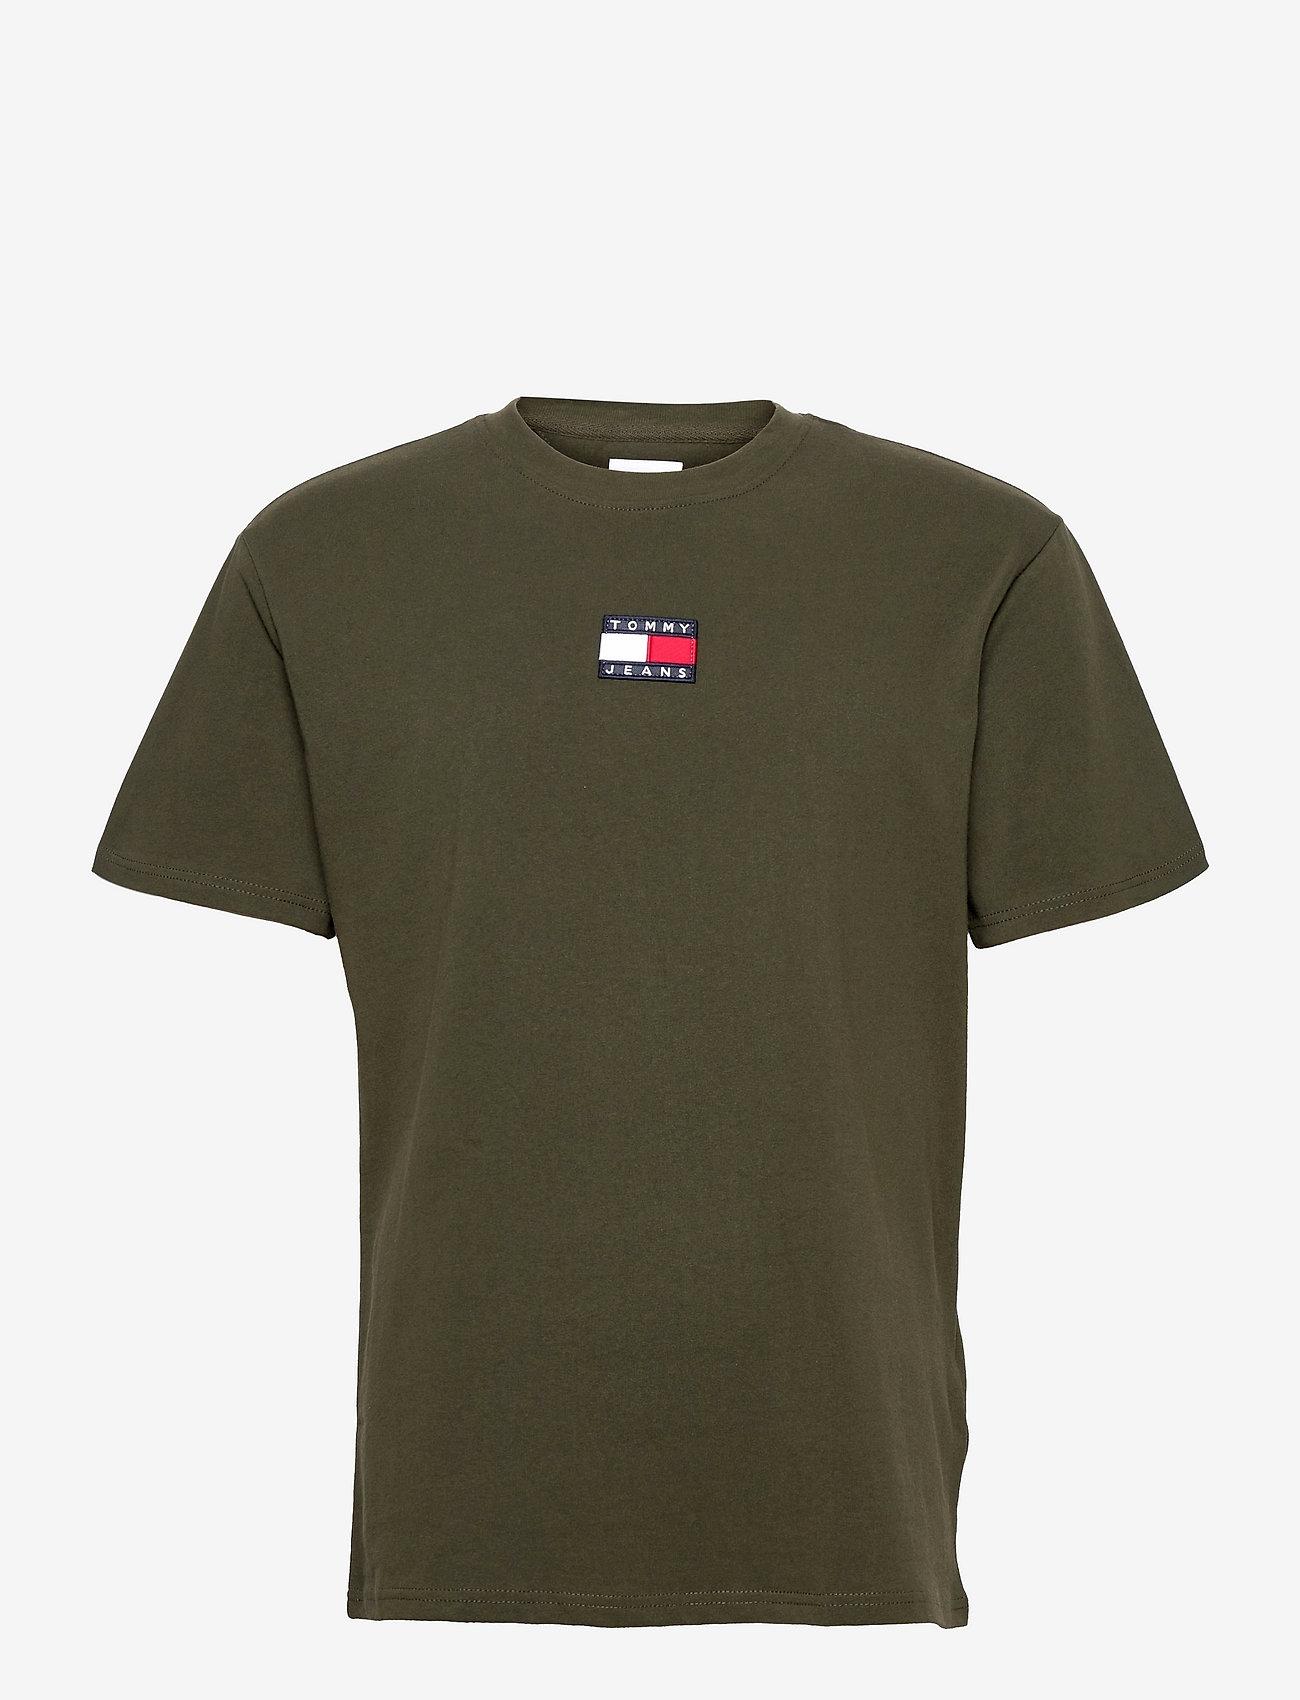 Tommy Jeans - TJM TOMMY BADGE TEE - kortärmade t-shirts - dark olive - 0